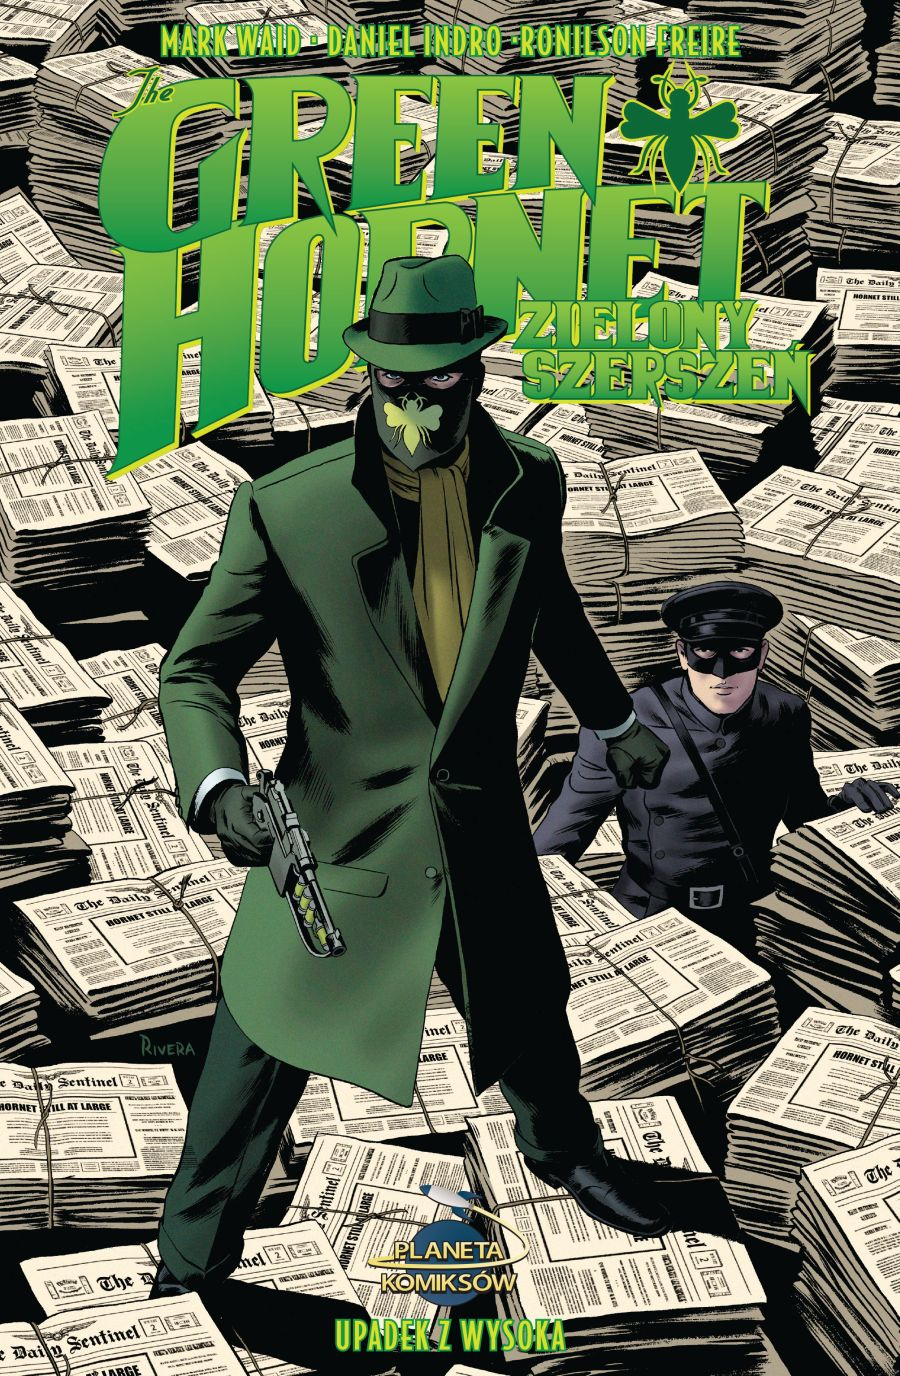 Green Hornet: Zielony Szerszeń – Upadek z wysoka